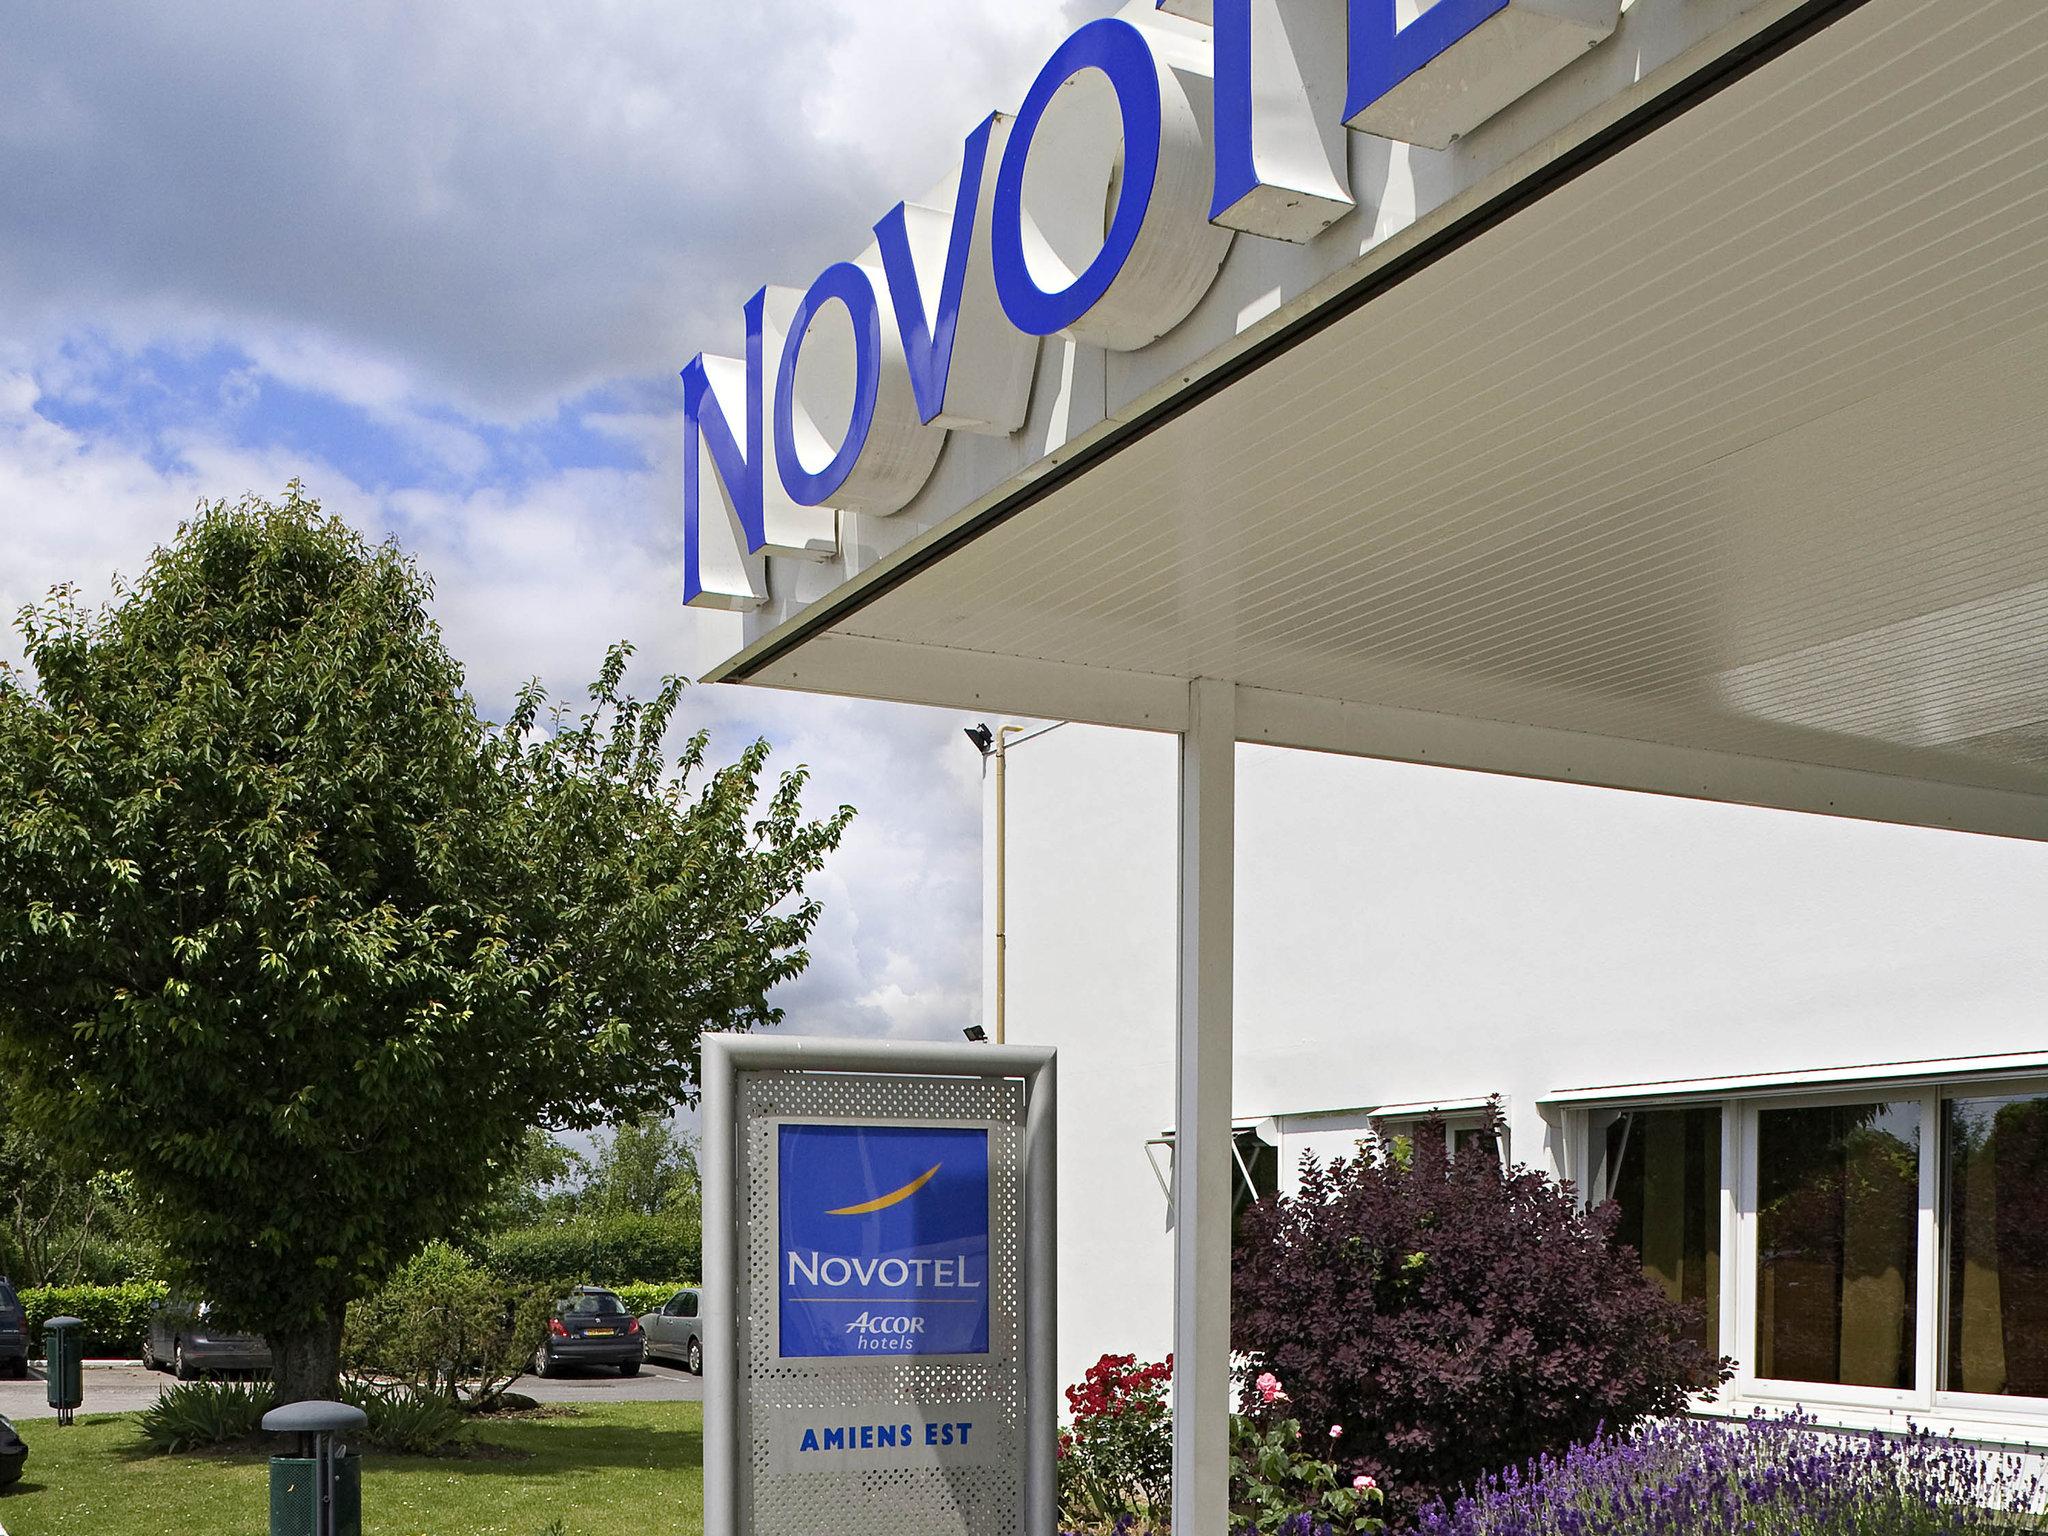 Novotel Amiens Est